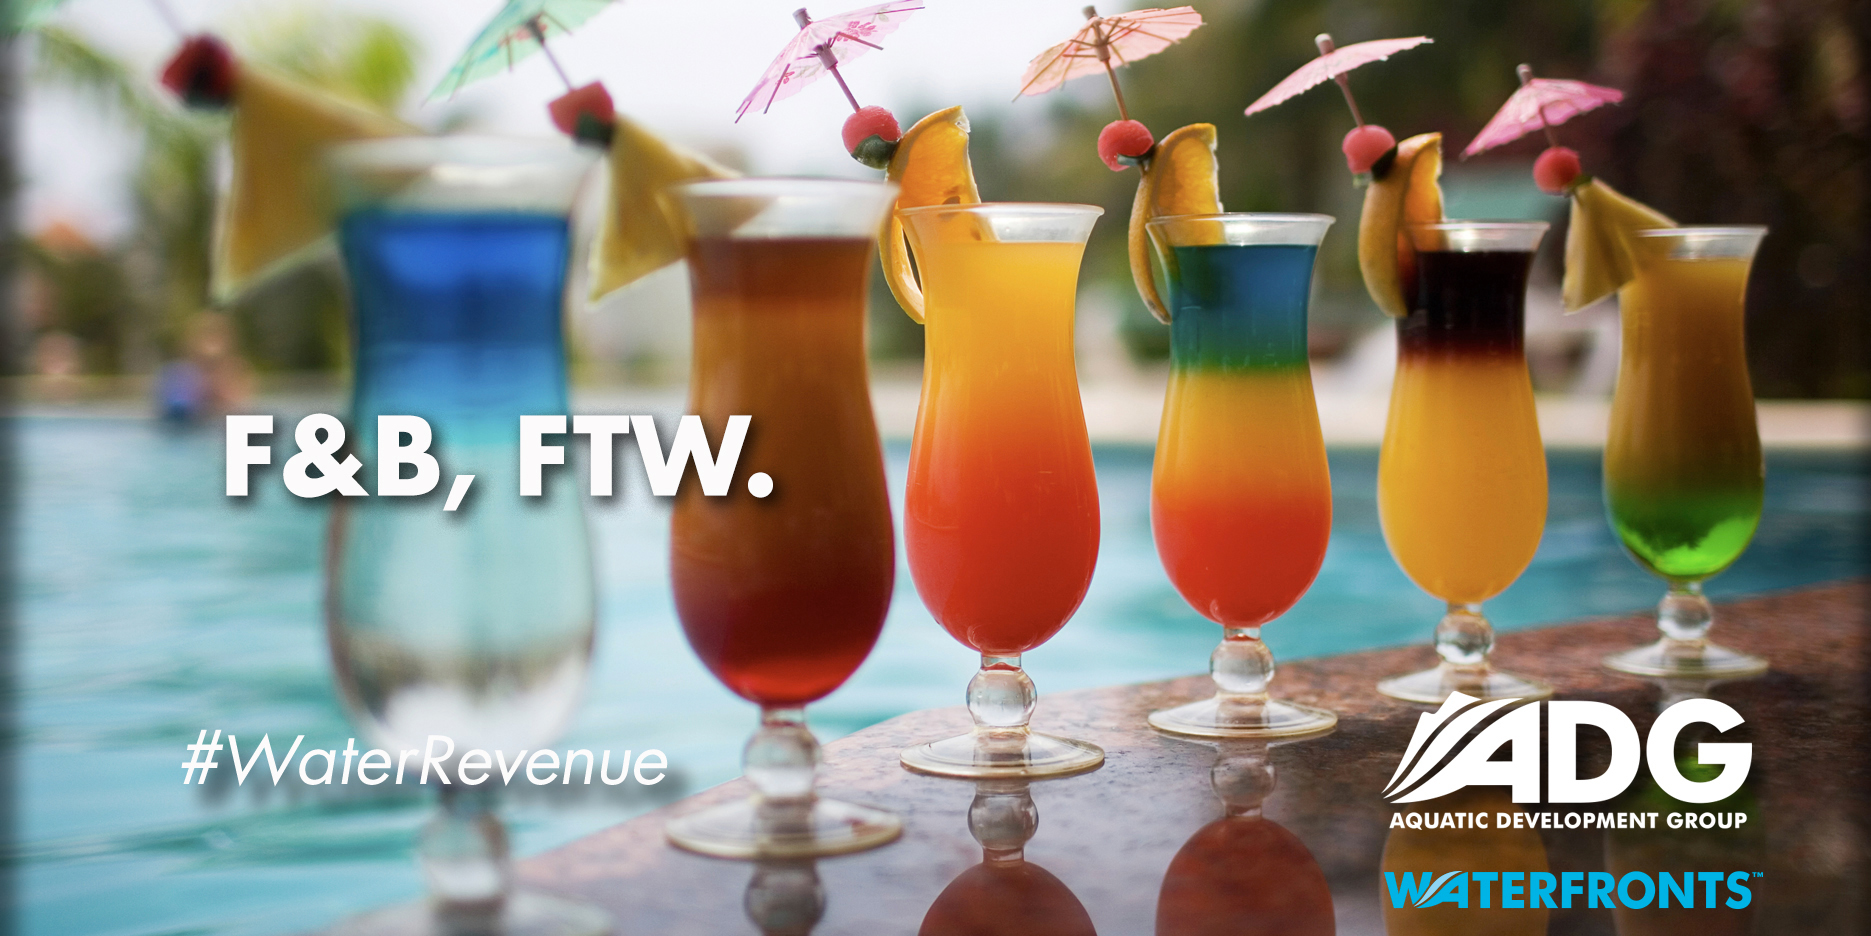 Resort Waterfront Food and Beverage